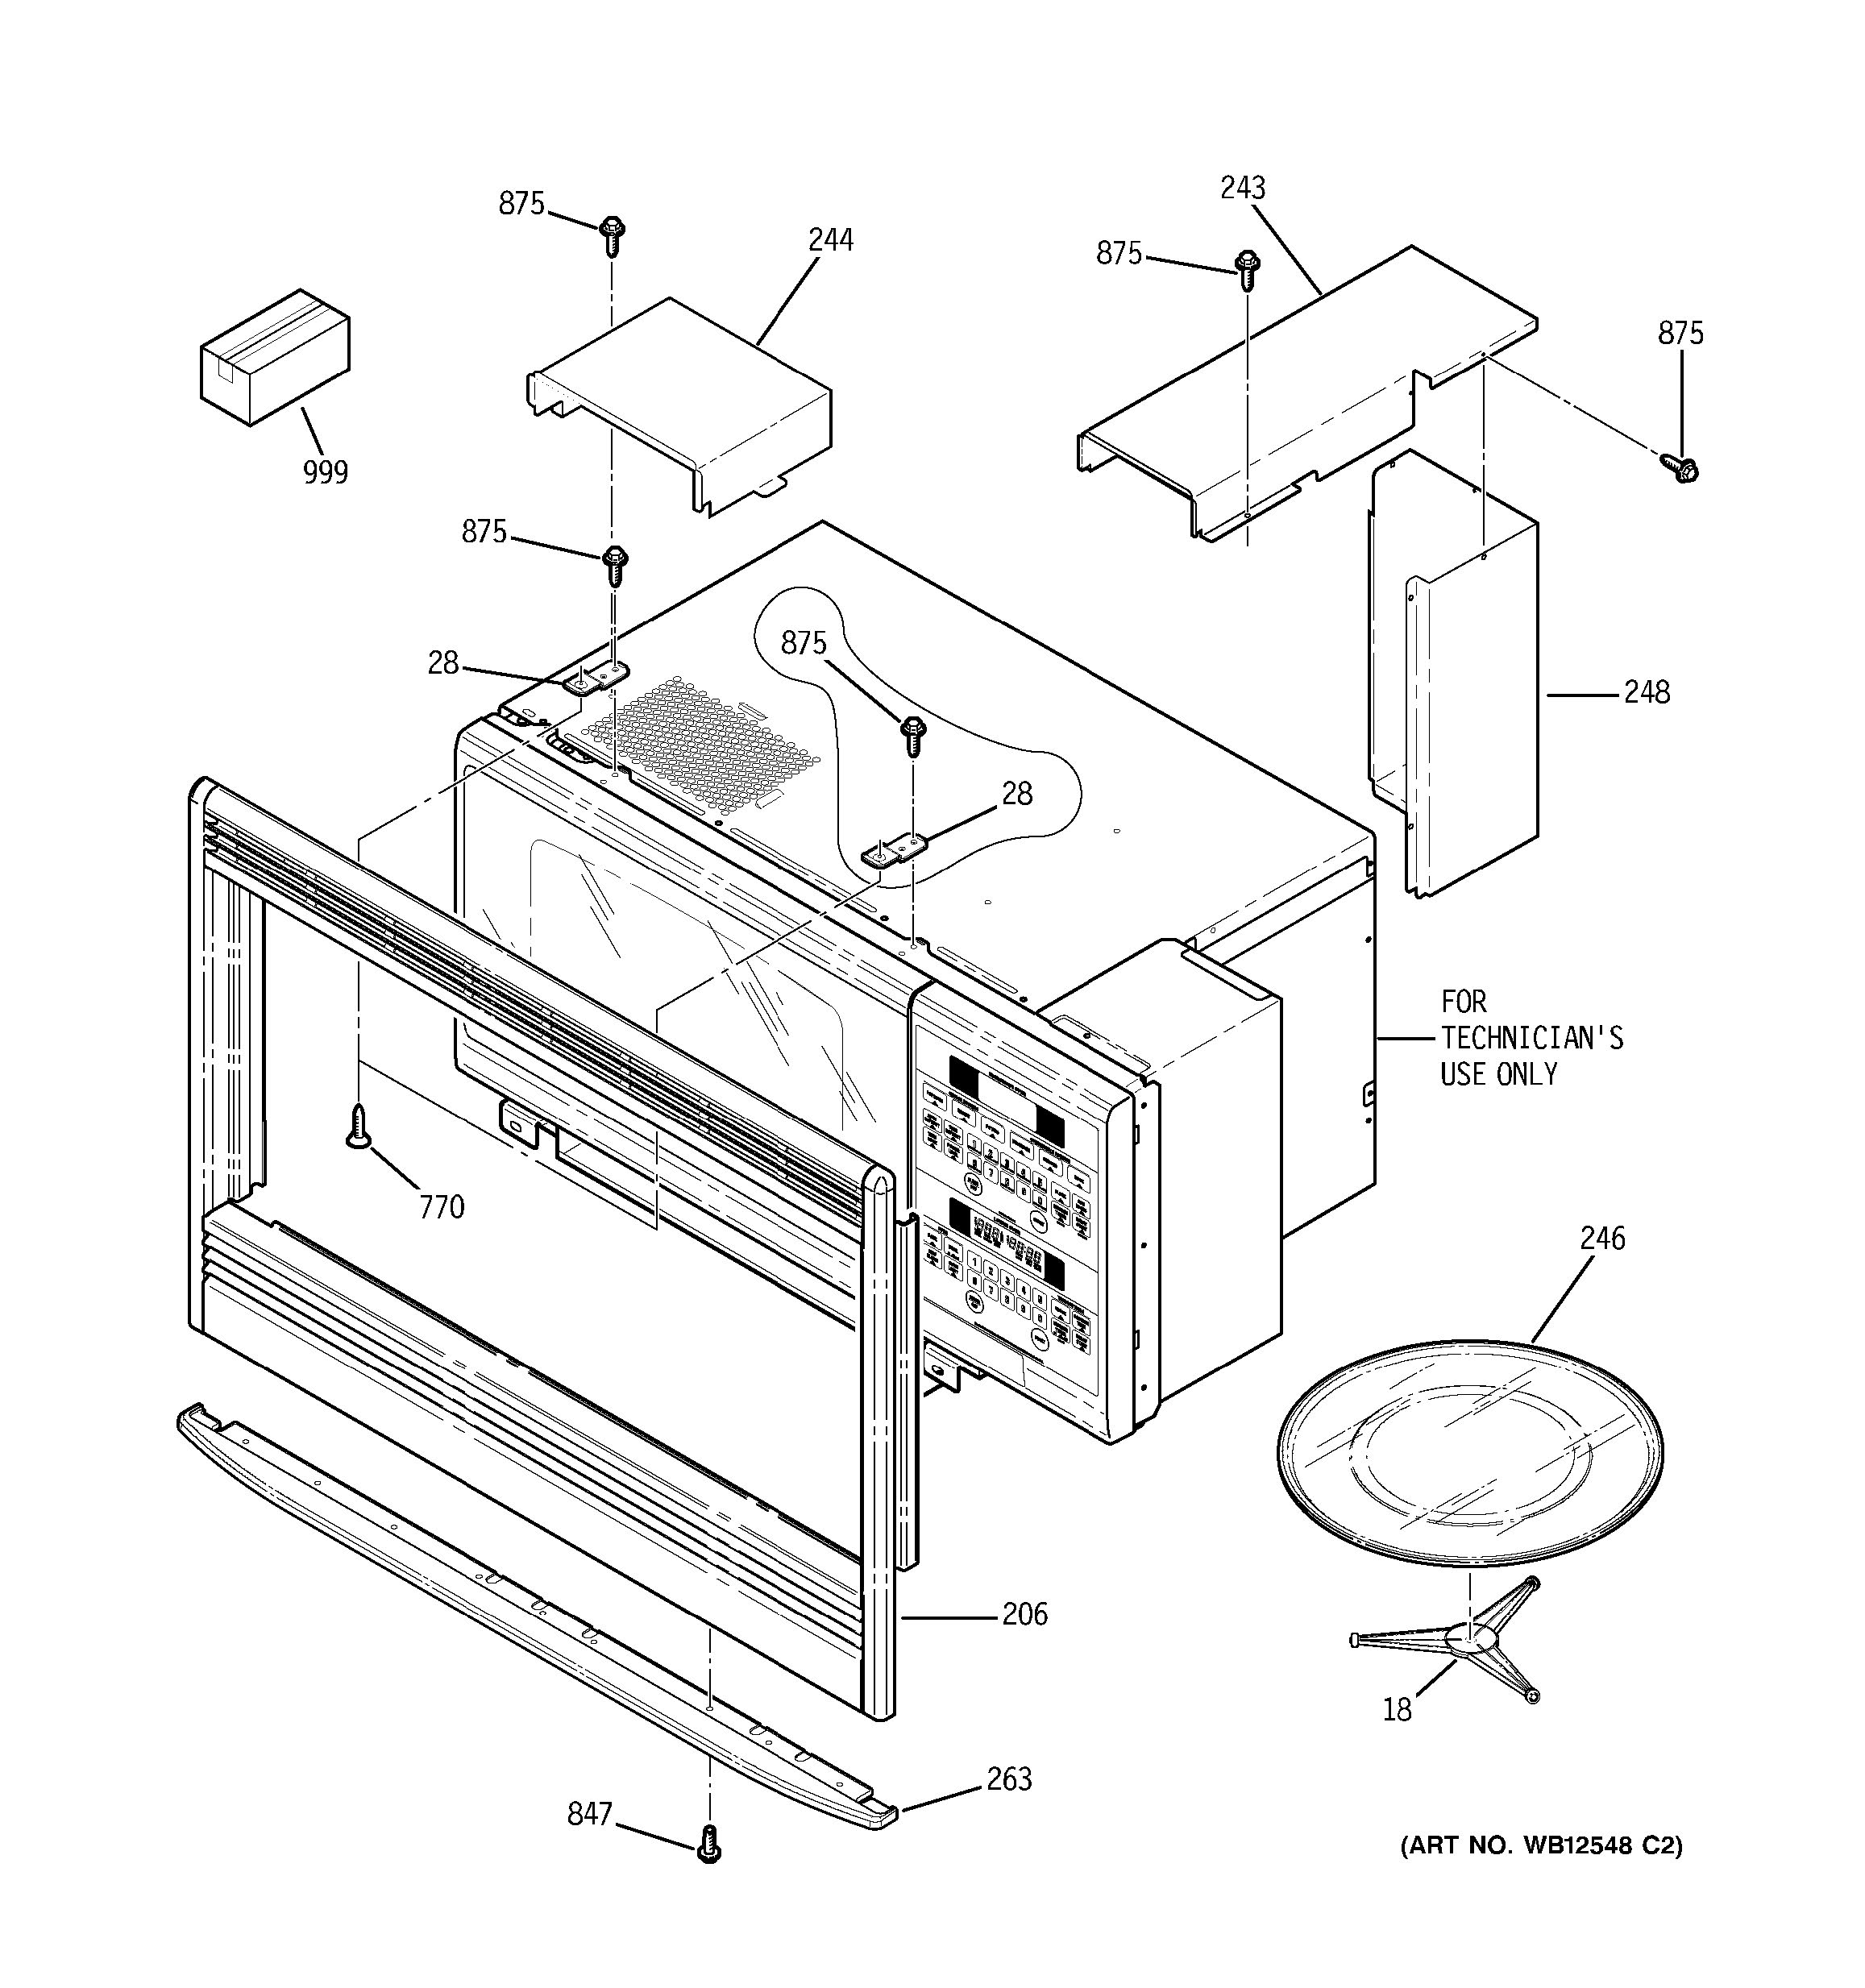 assembly view for microwave enclosure jtp86cf4cc. Black Bedroom Furniture Sets. Home Design Ideas